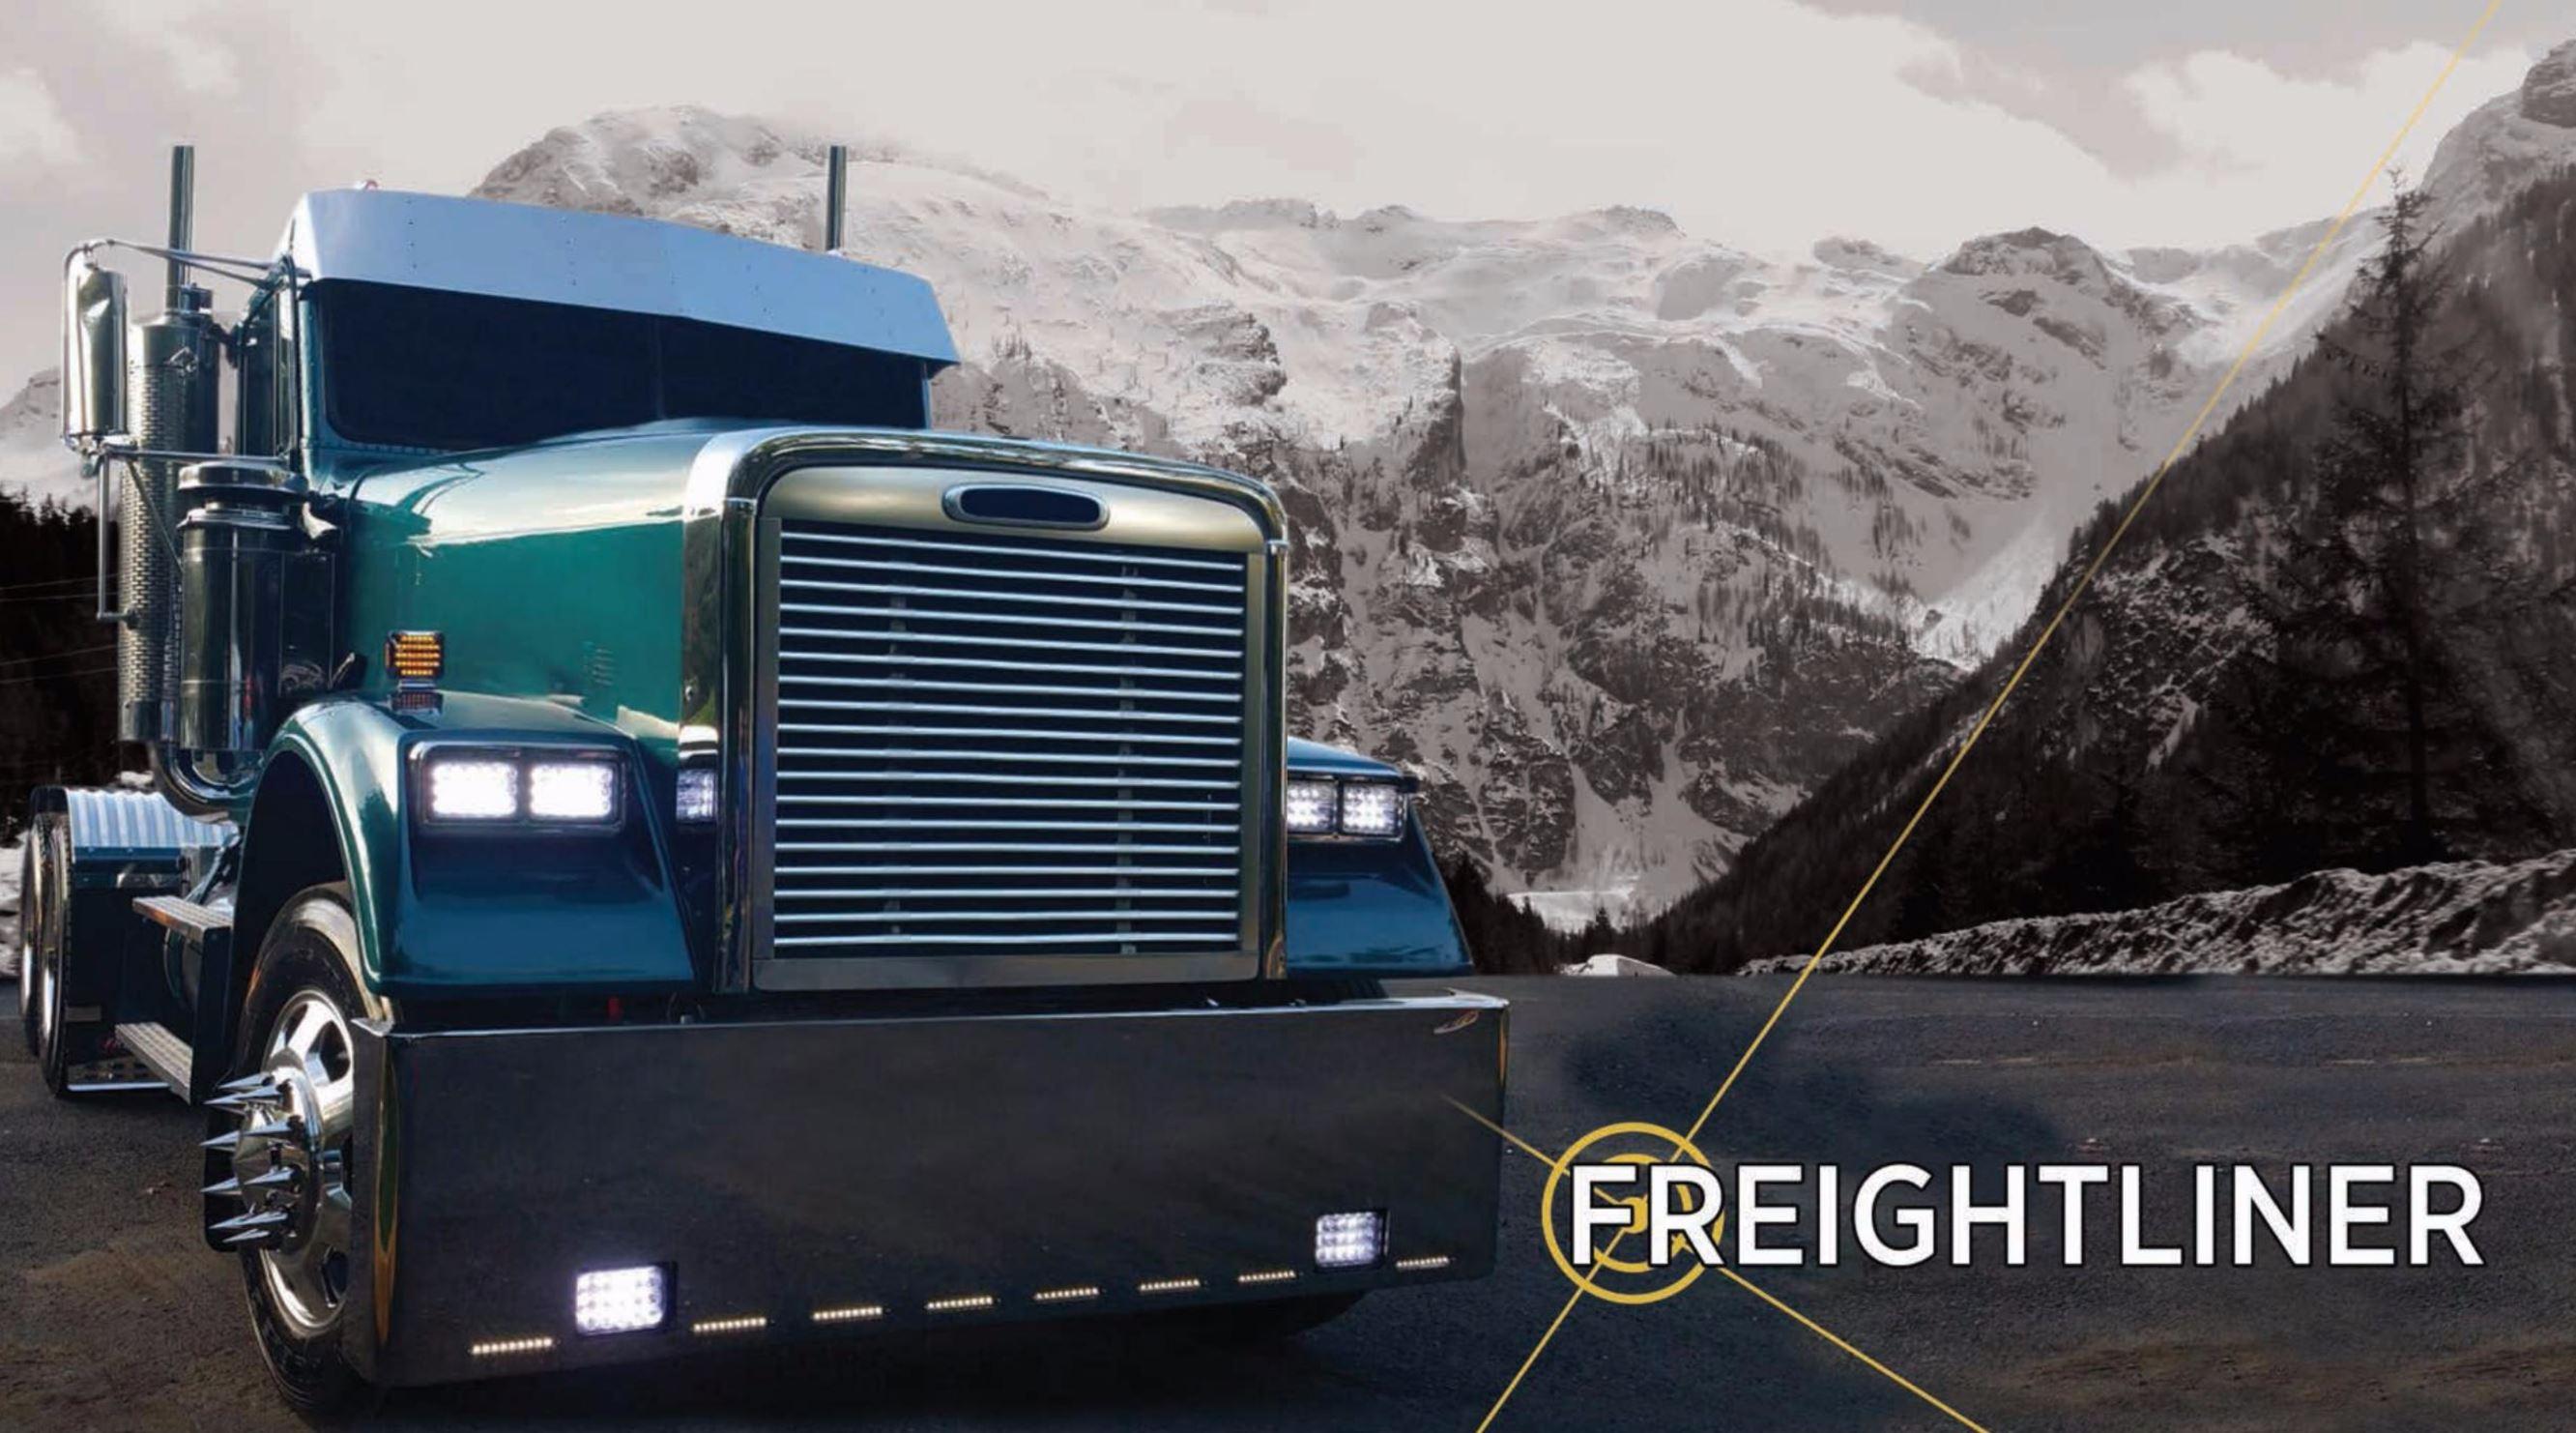 freightliner-truck-picture.jpg